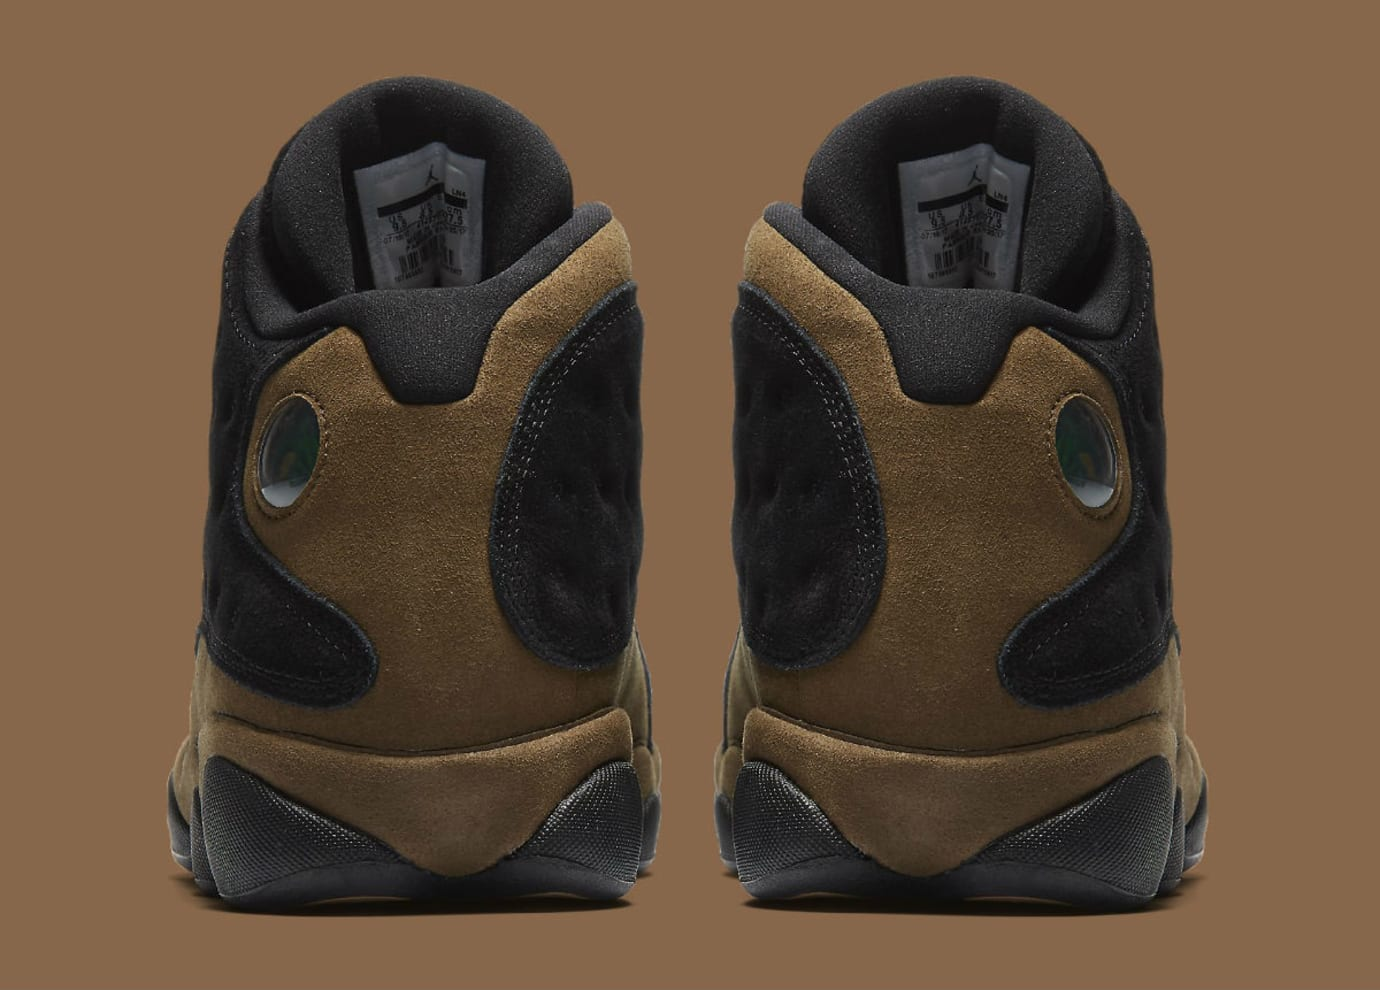 brand new d35e3 8c6b0 Air Jordan 13 XIII Olive Release Date 414571-006 Heel